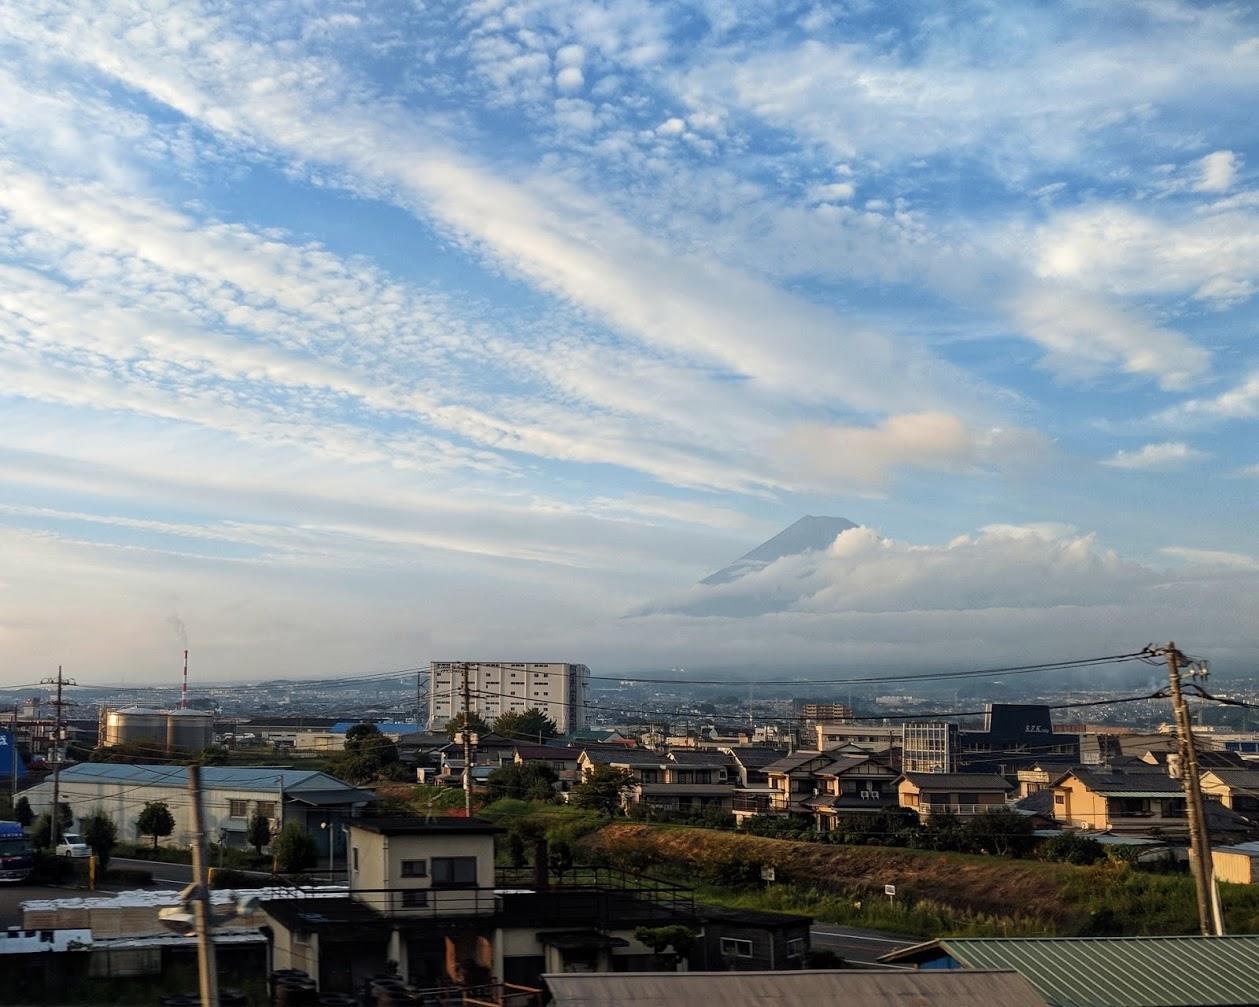 Фудзи выглянул из-за облаков, катим в Нагоя на скорости за 300